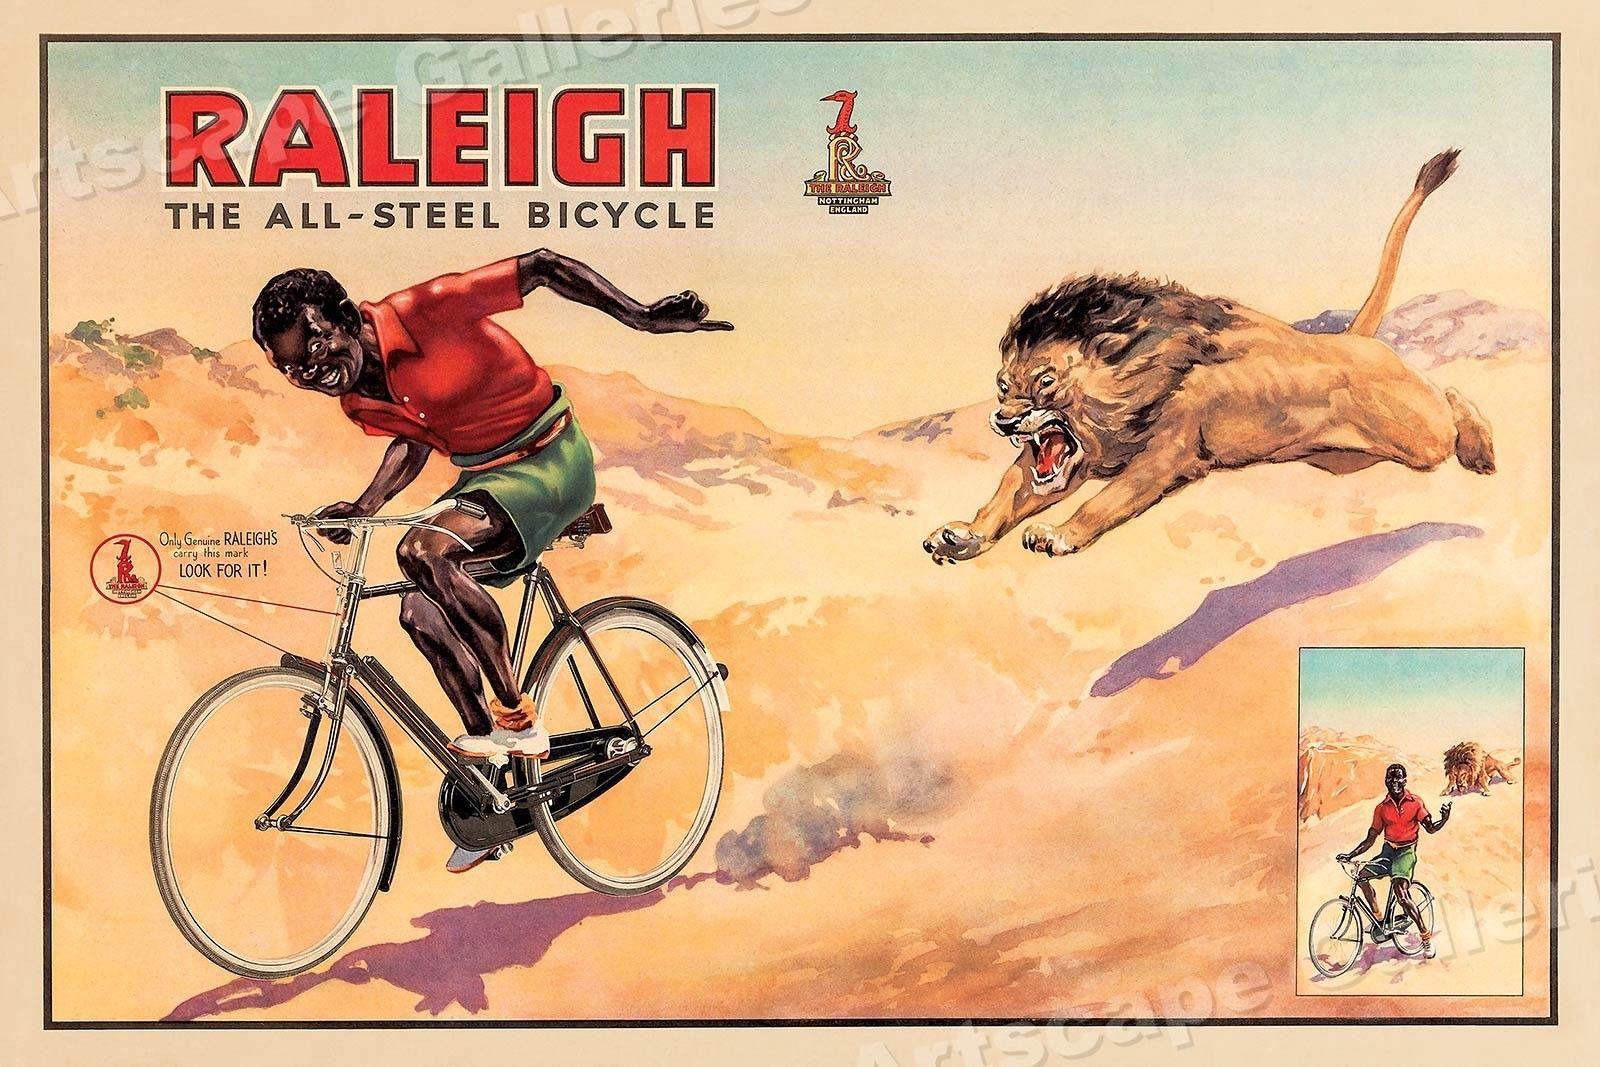 Raleigh kerékpárok